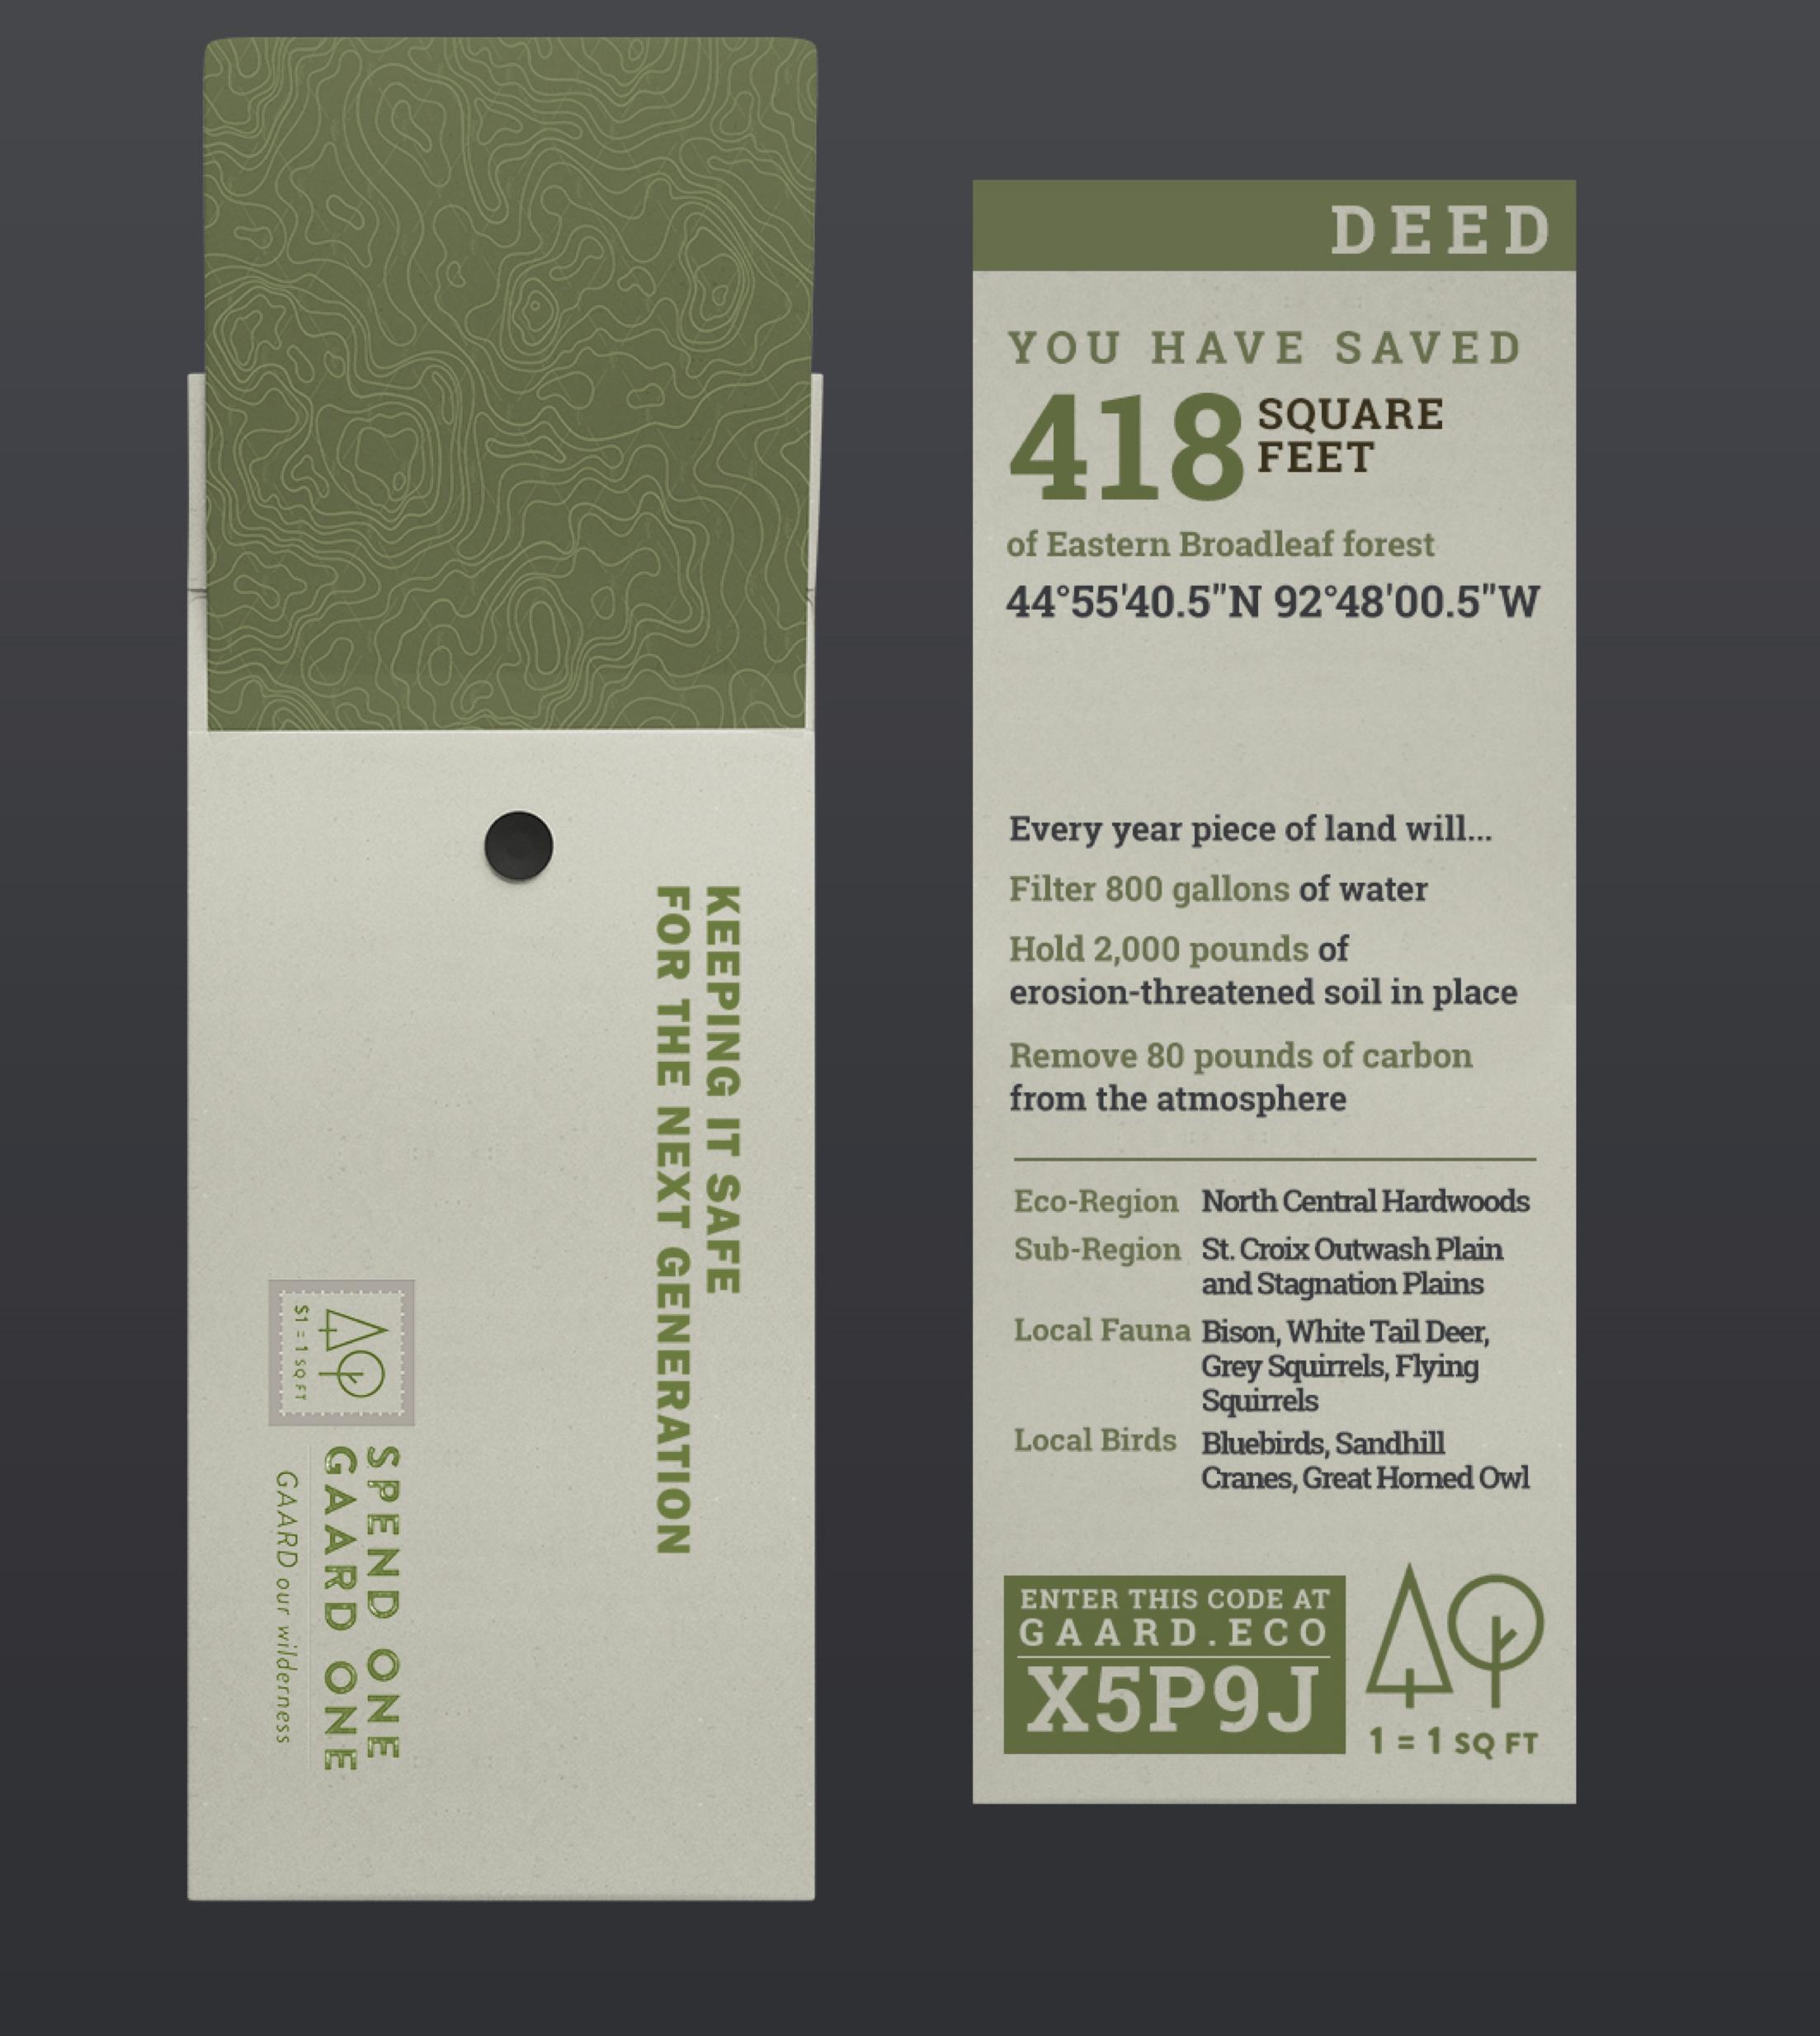 Deed design by Alex Nee